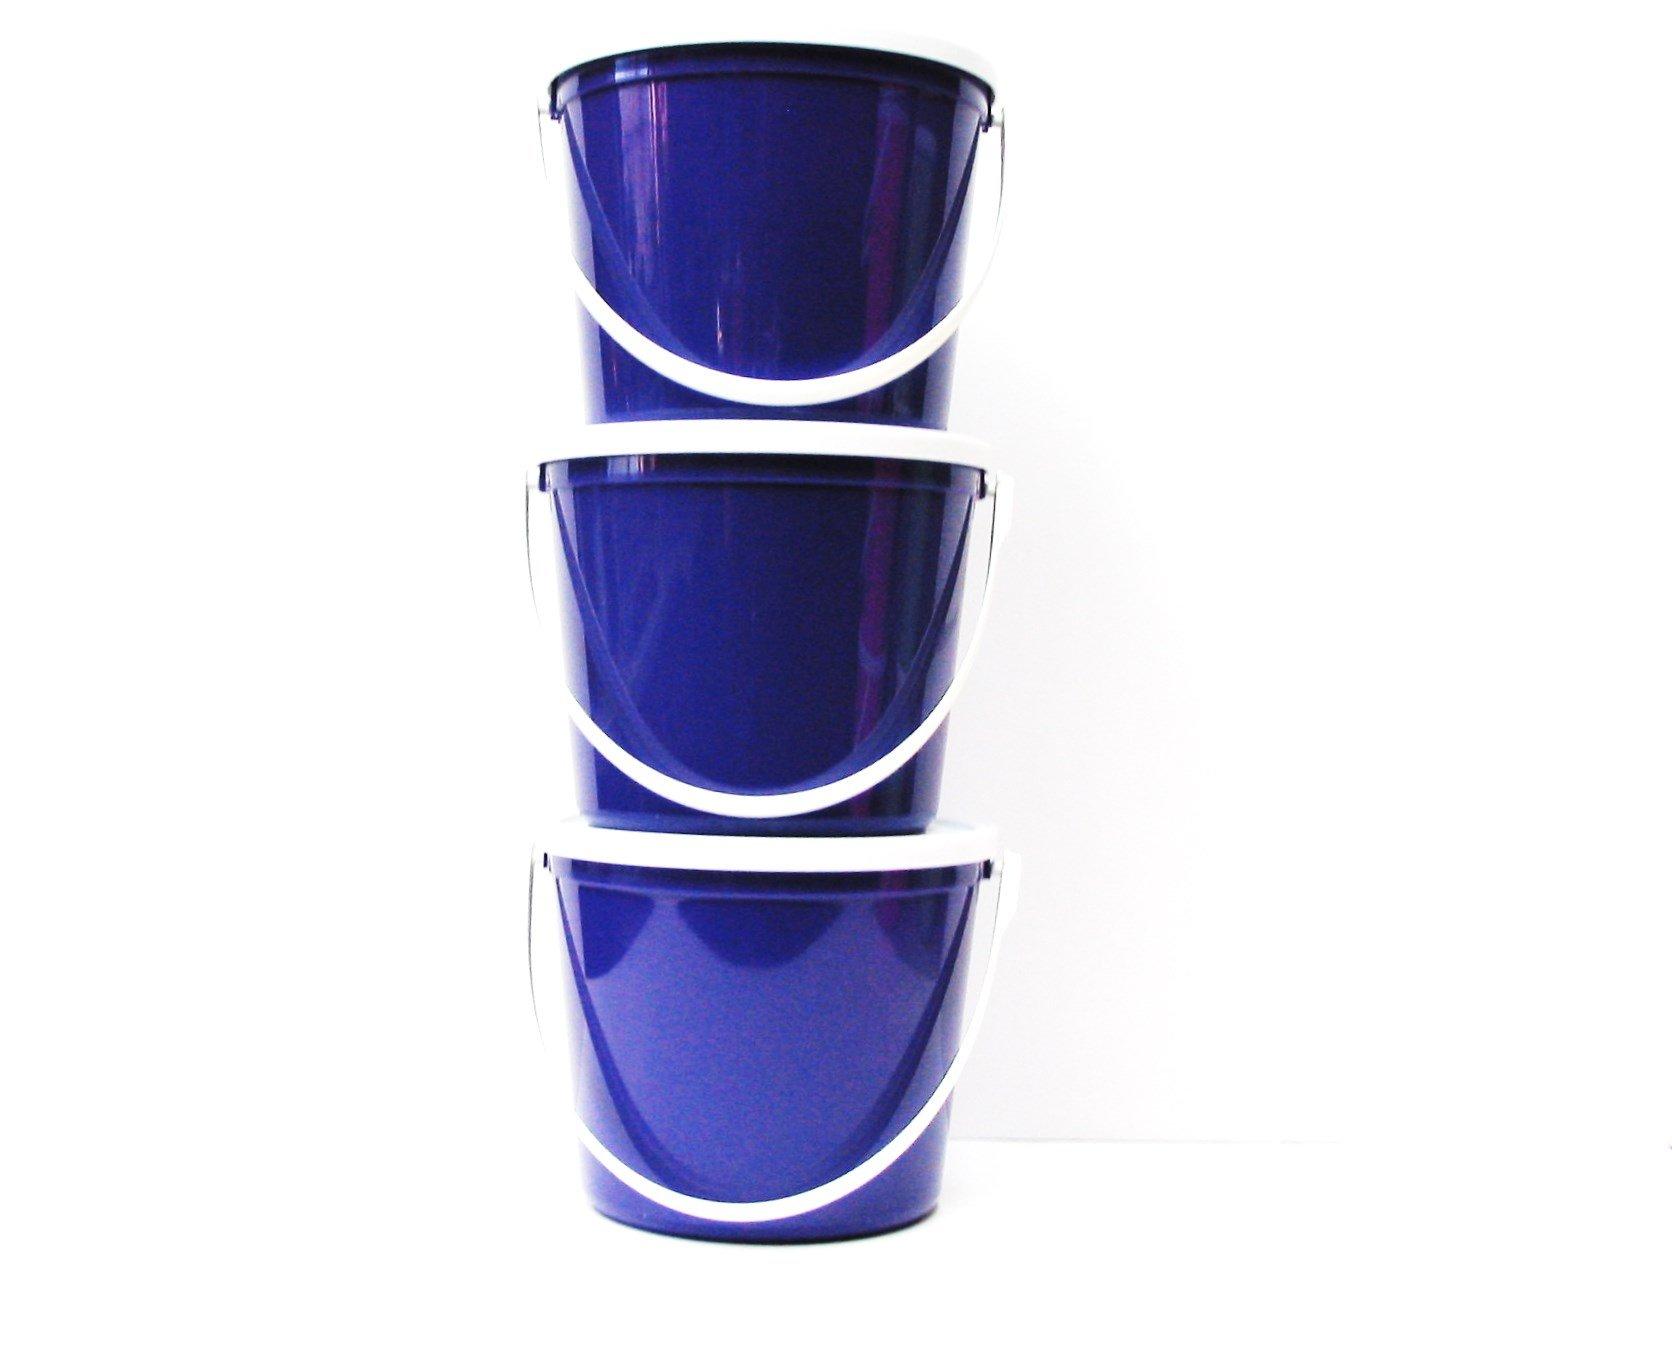 Talisman, Plastic Buckets & Lids, 80 Ounces, 3 Pack, Purple by Talisman (Image #1)